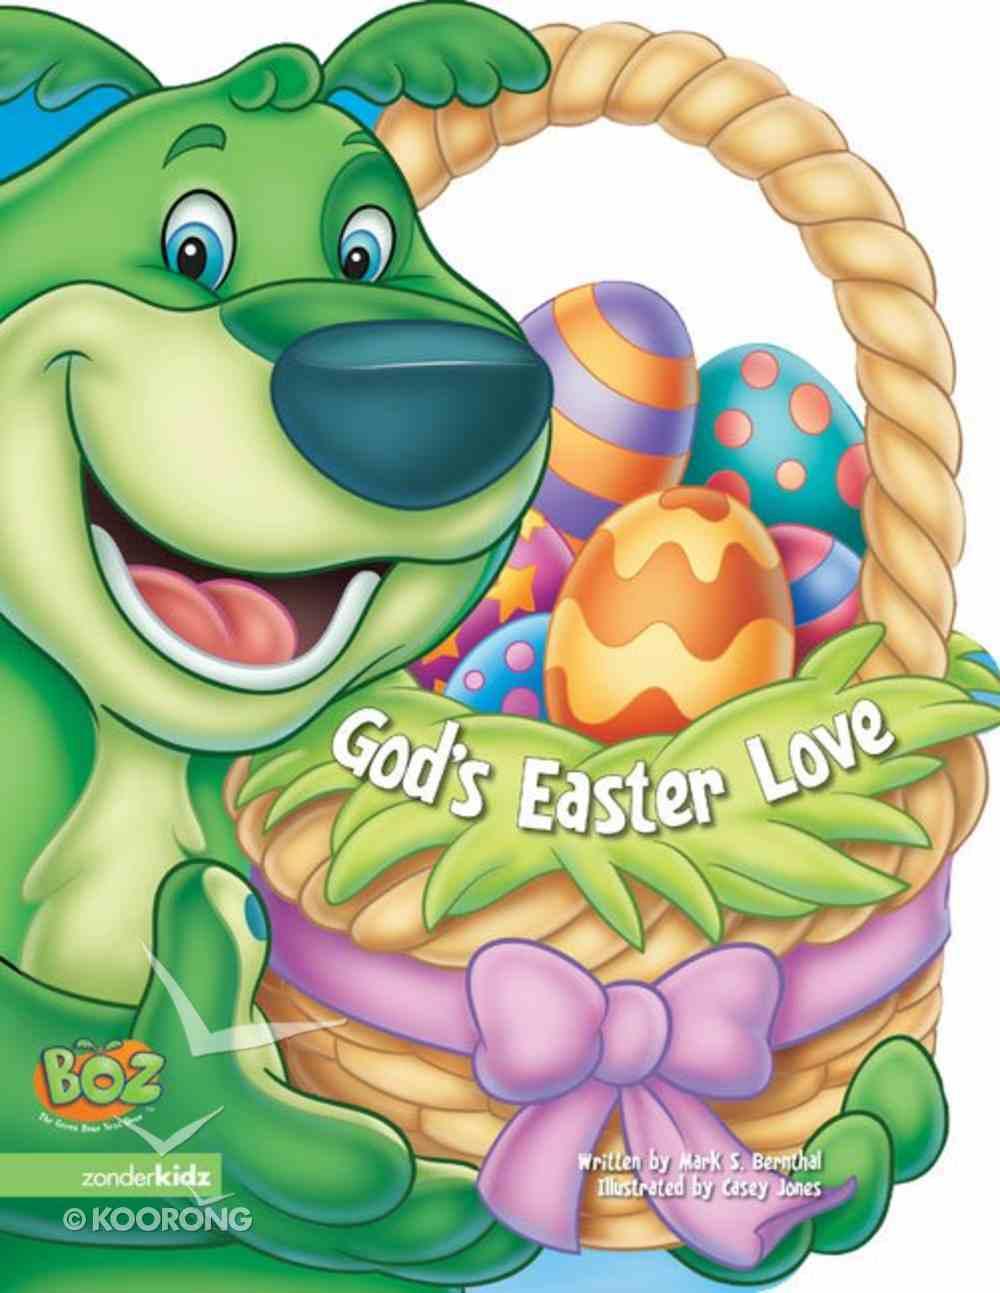 God's Easter Love (Boz The Bear Series) eBook